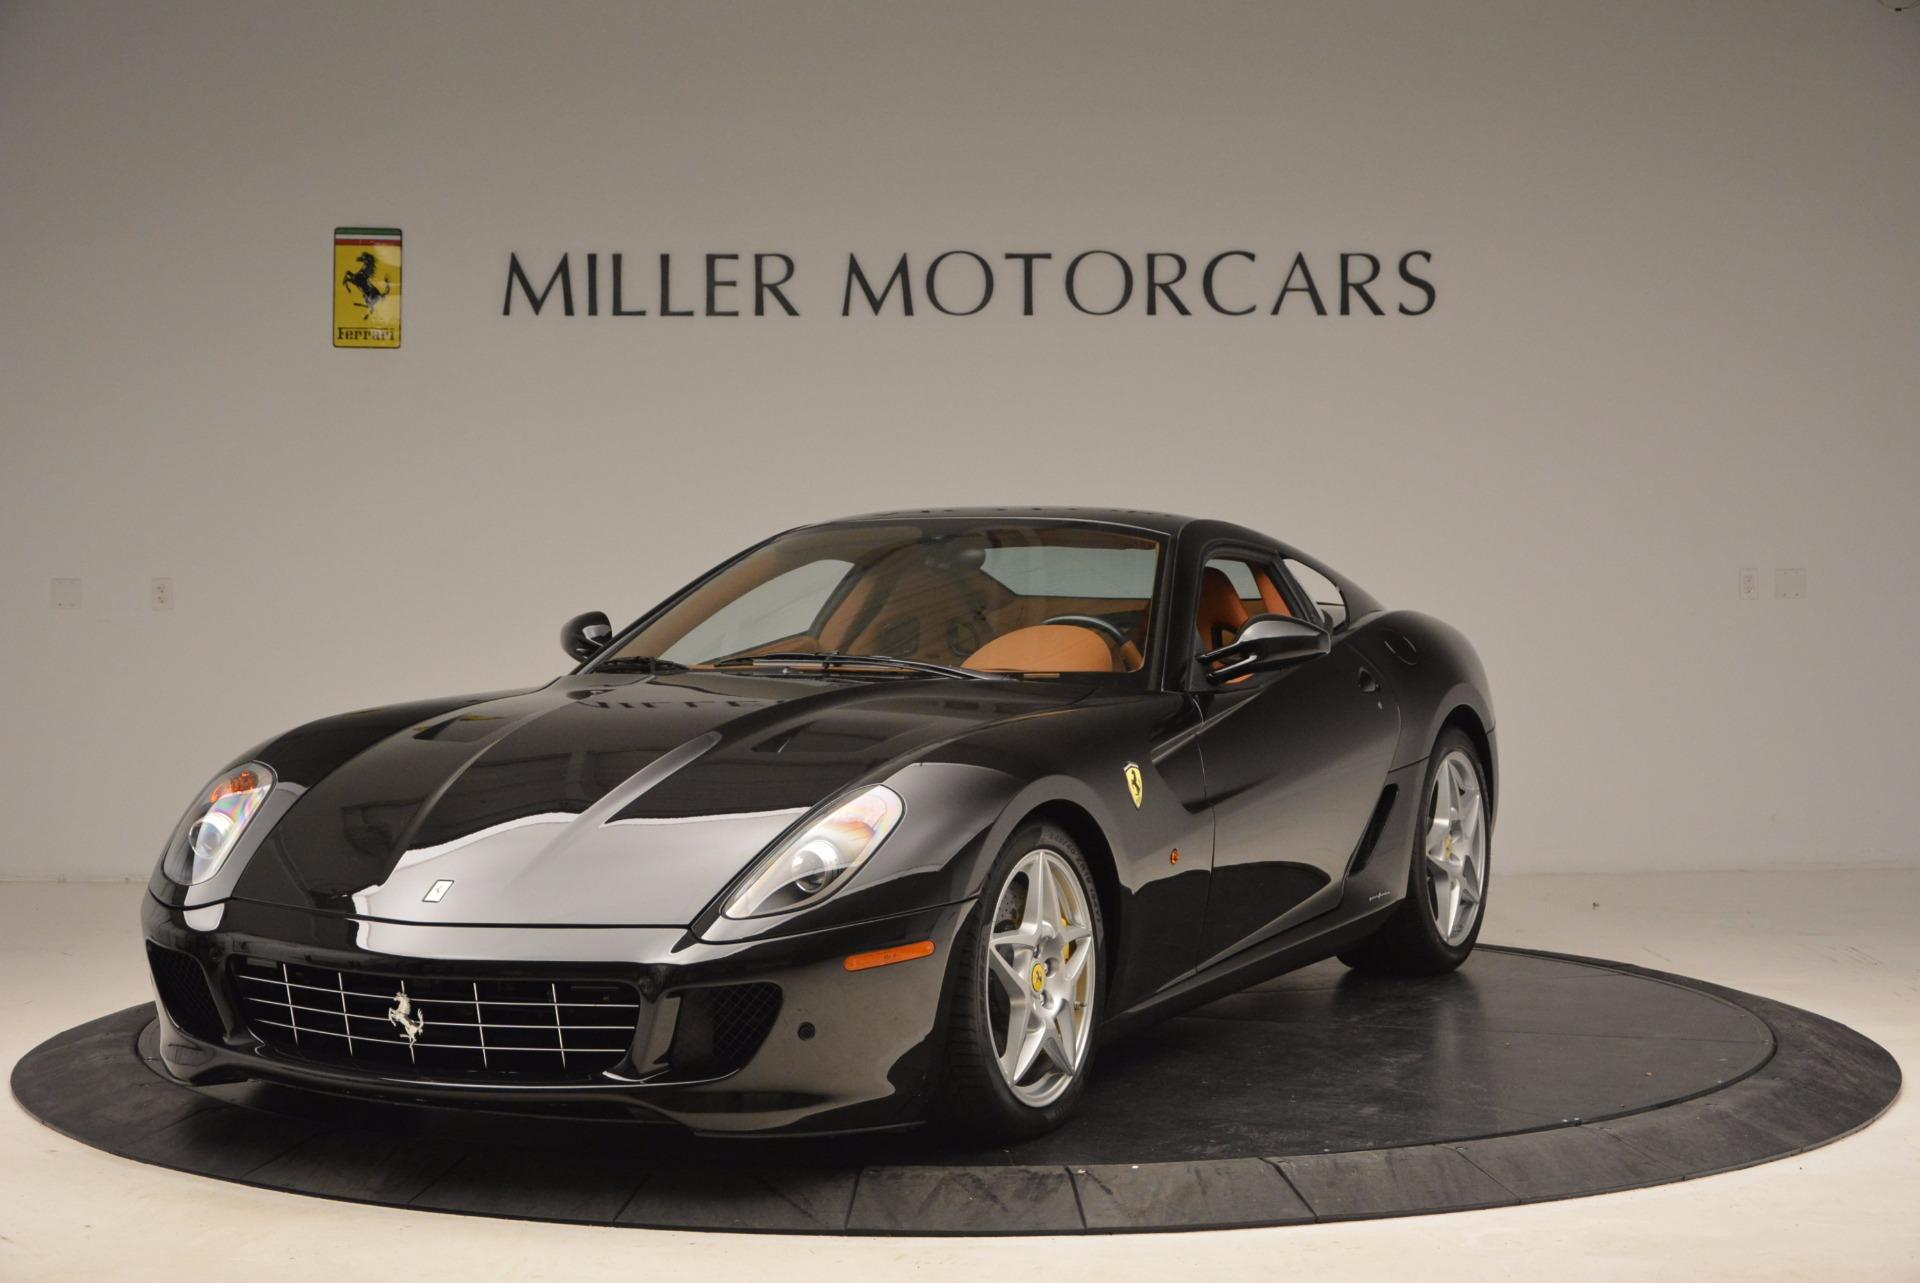 Used 2008 Ferrari 599 GTB Fiorano for sale Sold at Rolls-Royce Motor Cars Greenwich in Greenwich CT 06830 1